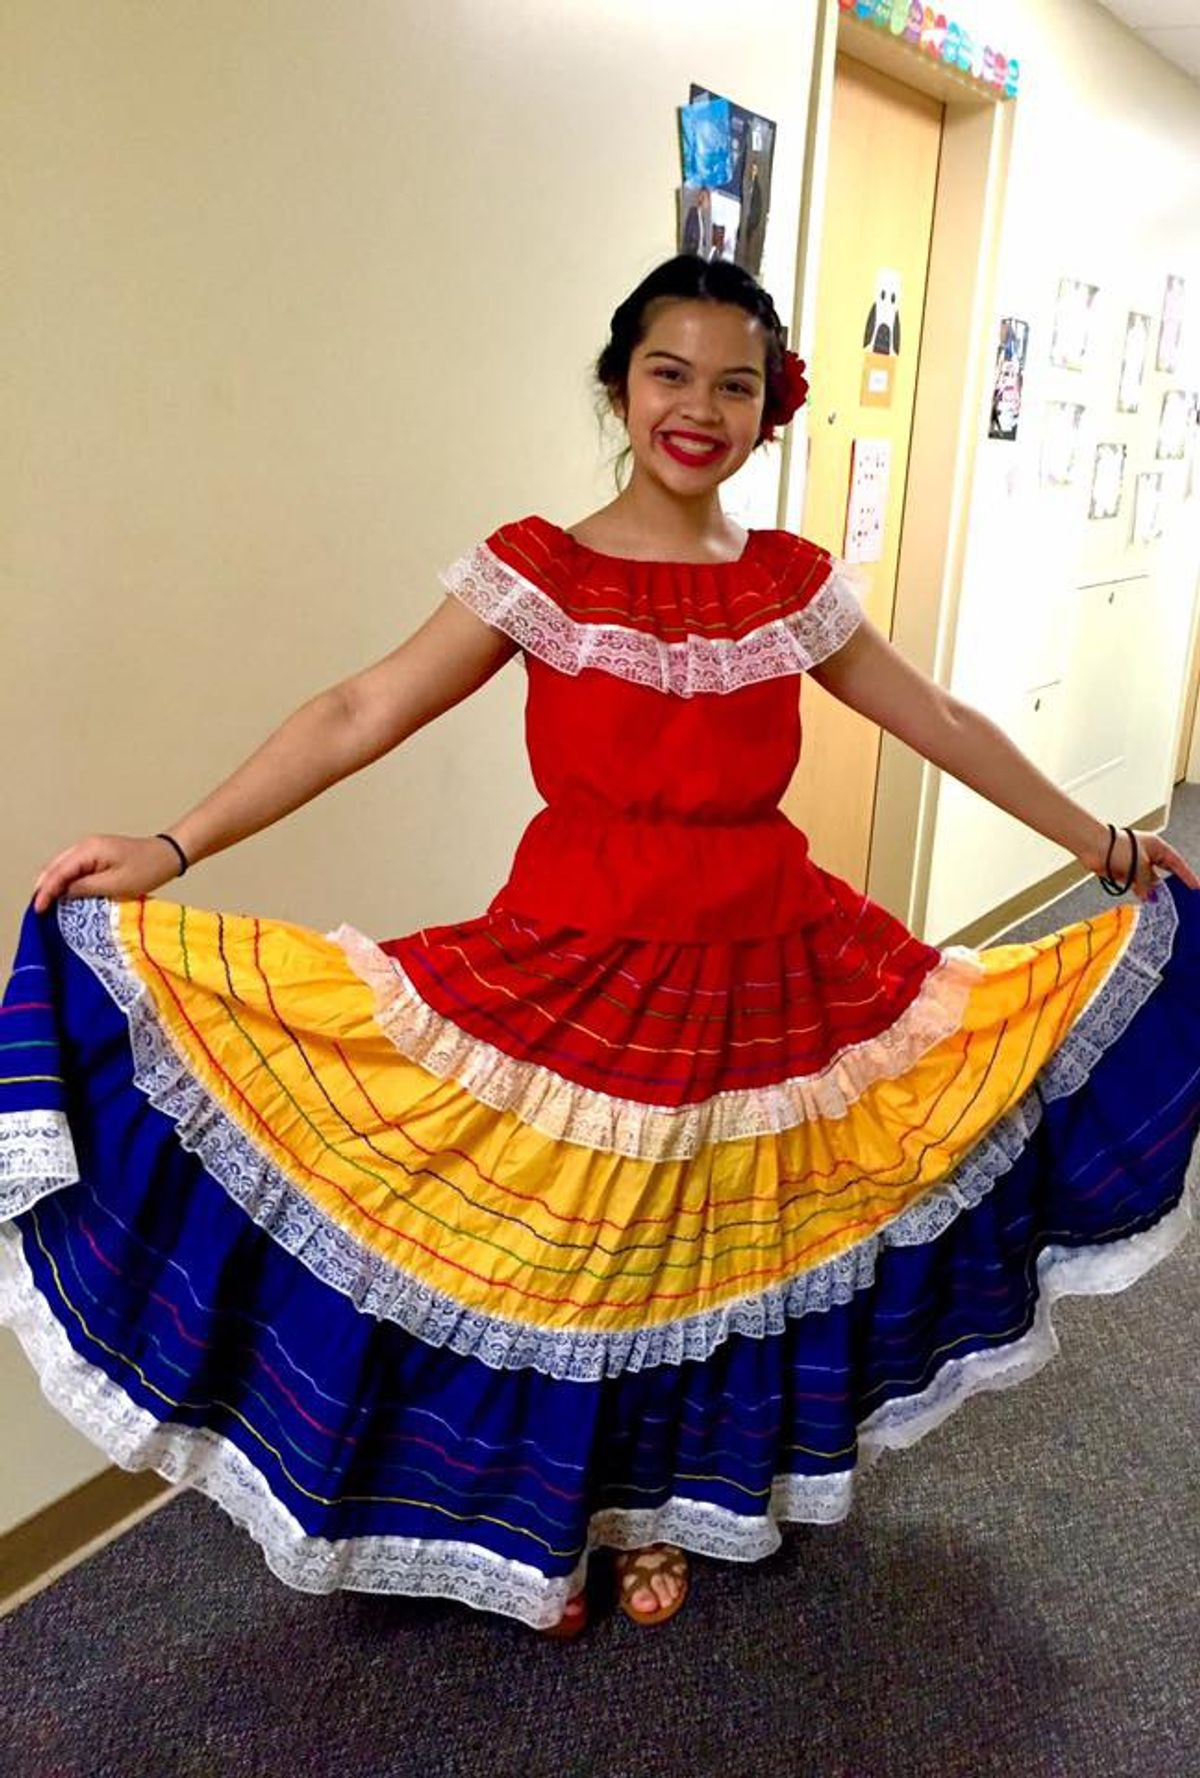 My Hispanic Identity As A College Student